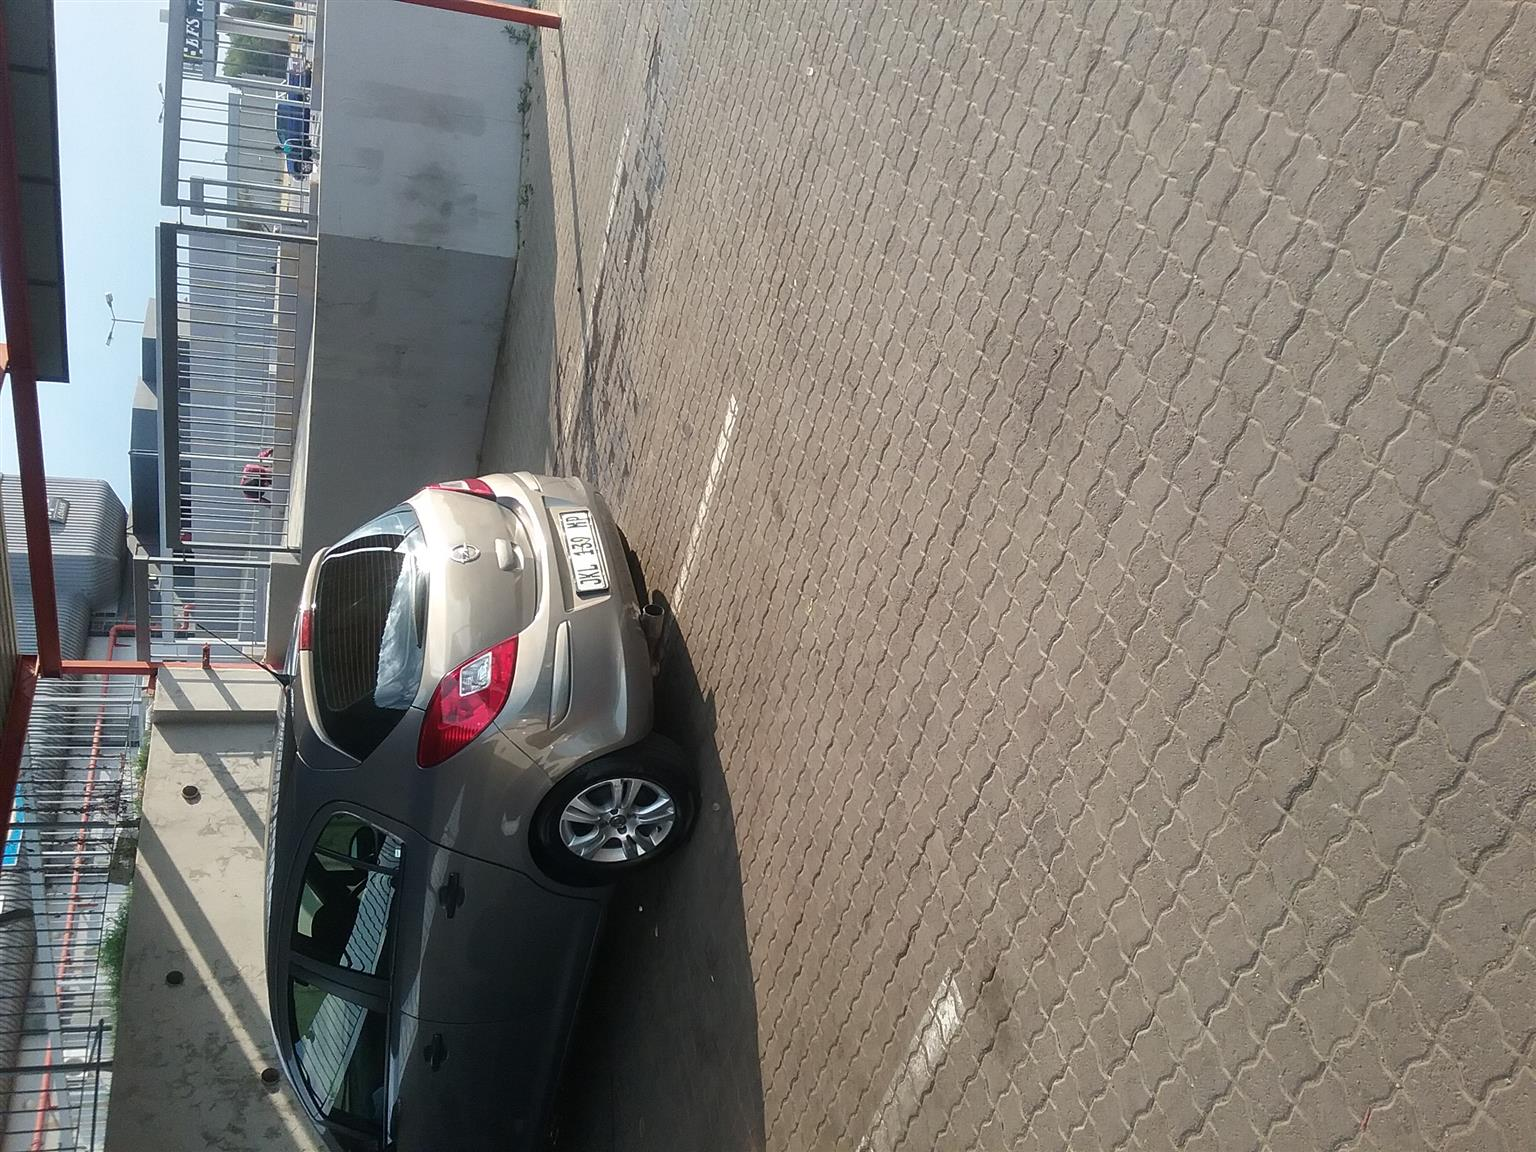 2013 Opel Corsa hatch 5-door CORSA 1.0T ECOFLEX ESSENTIA 5DR